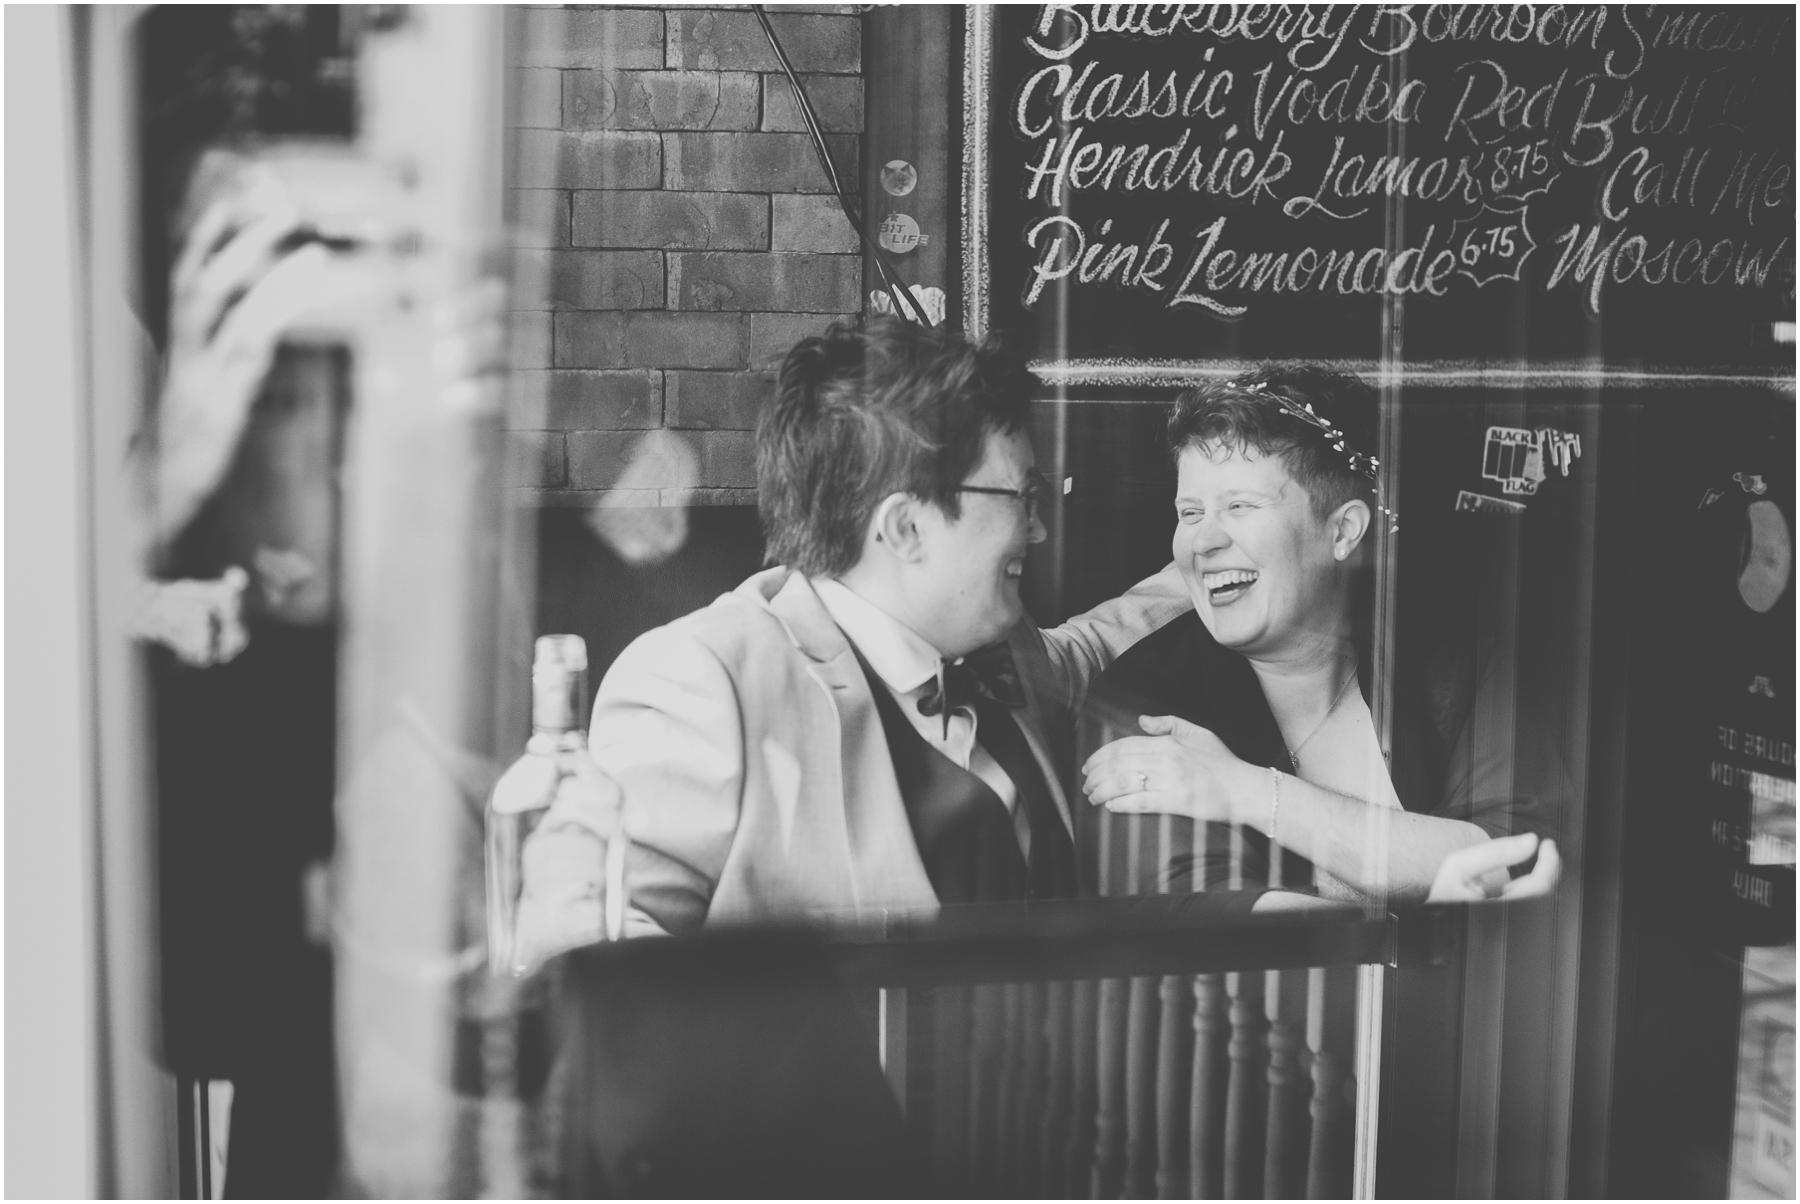 The Dime brides cuddling in window